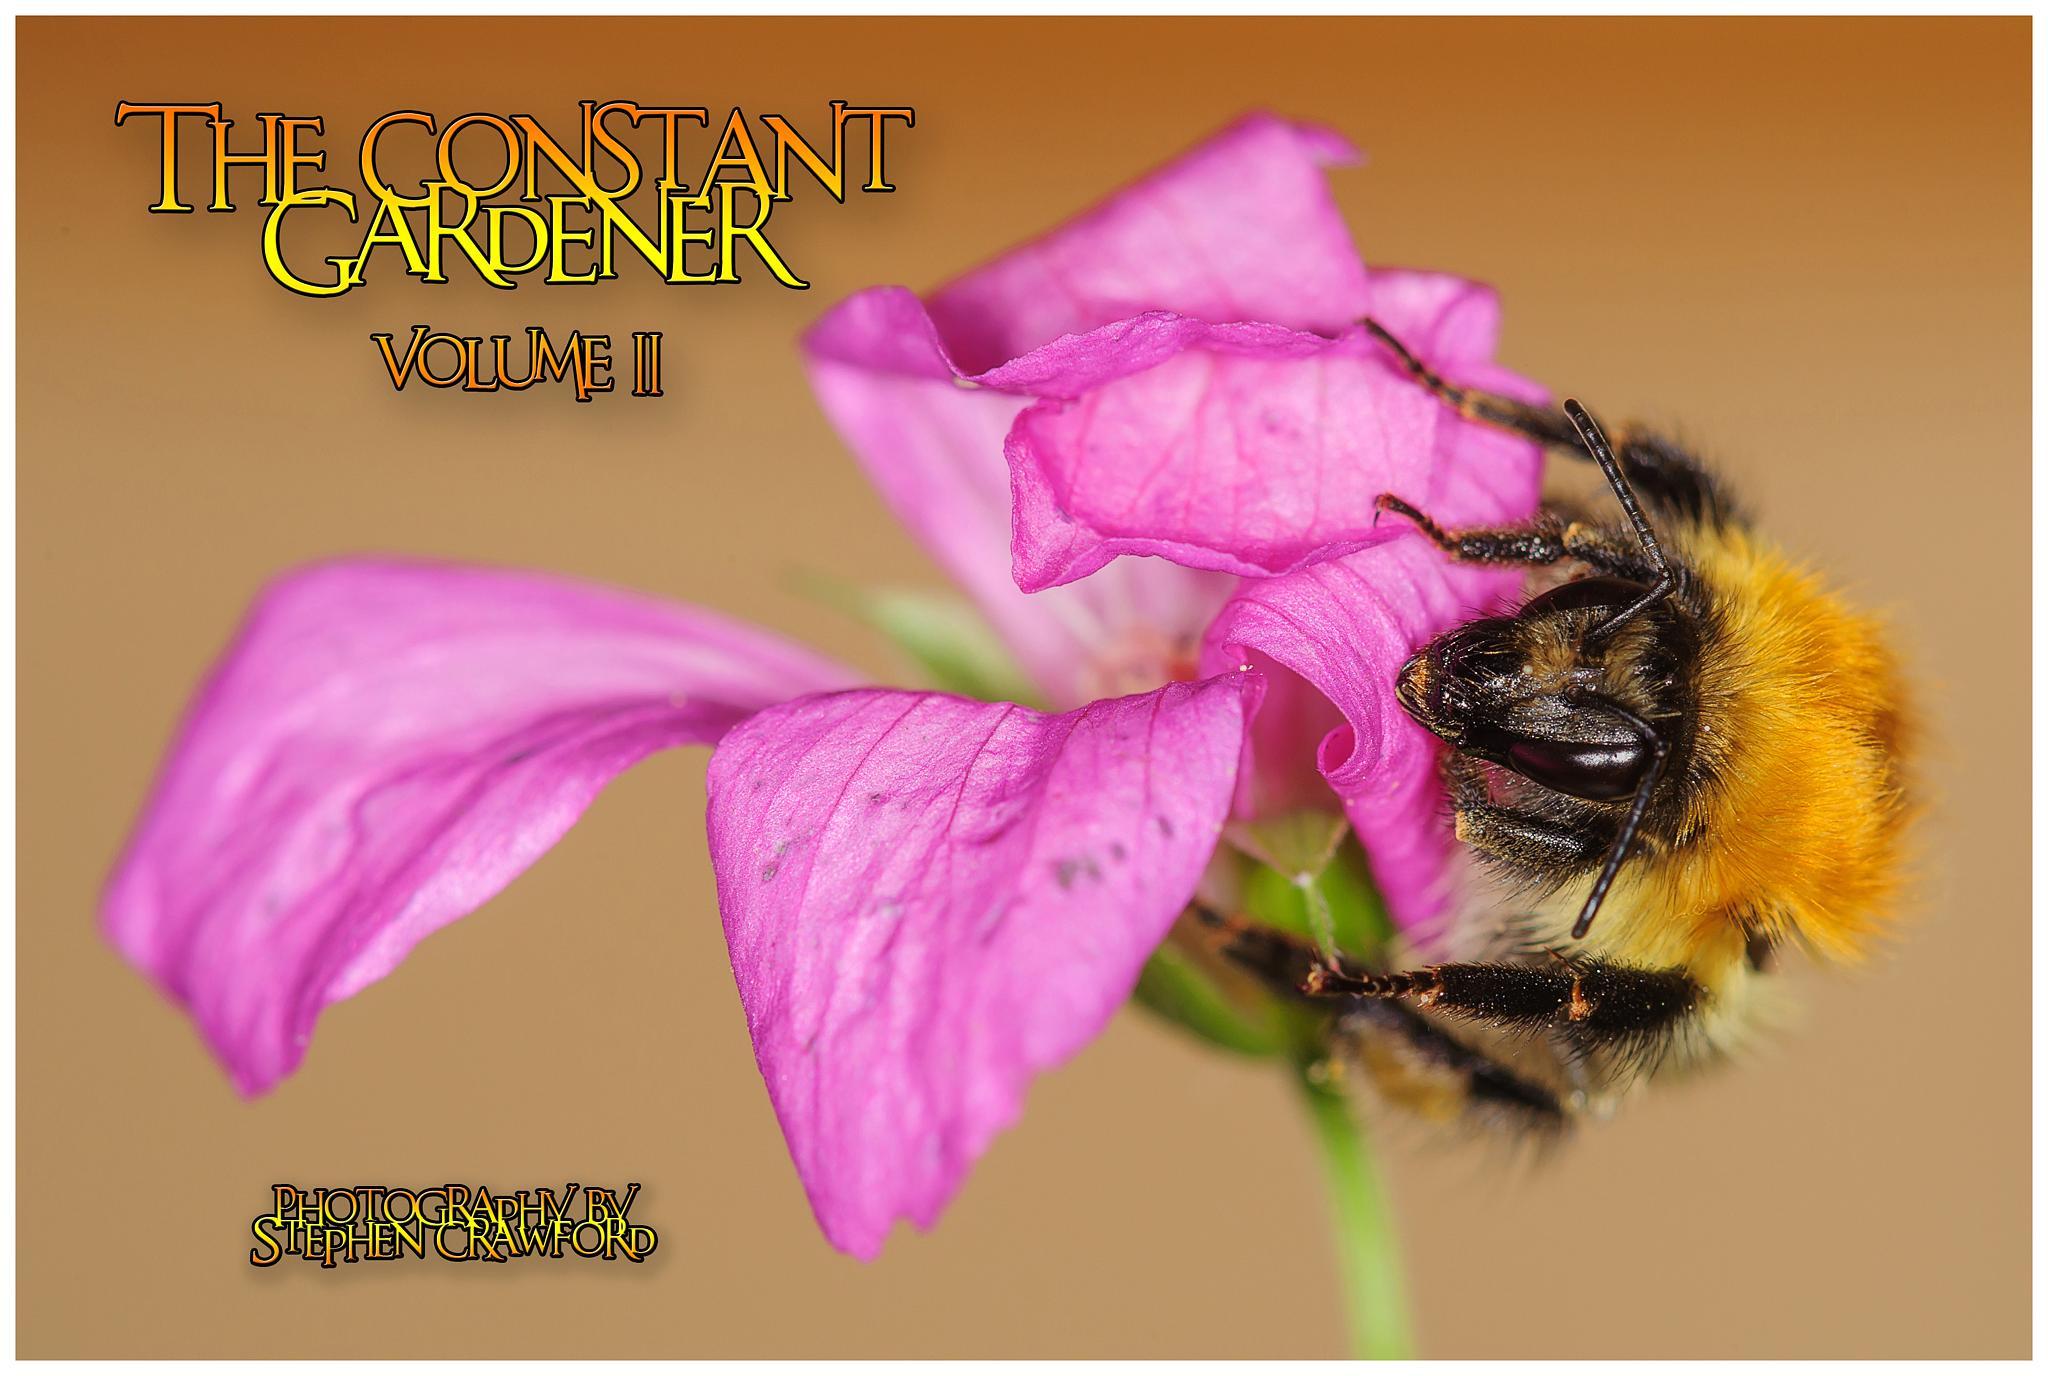 Cover of Lynda's garden book by scrawcreations  (Stephen)